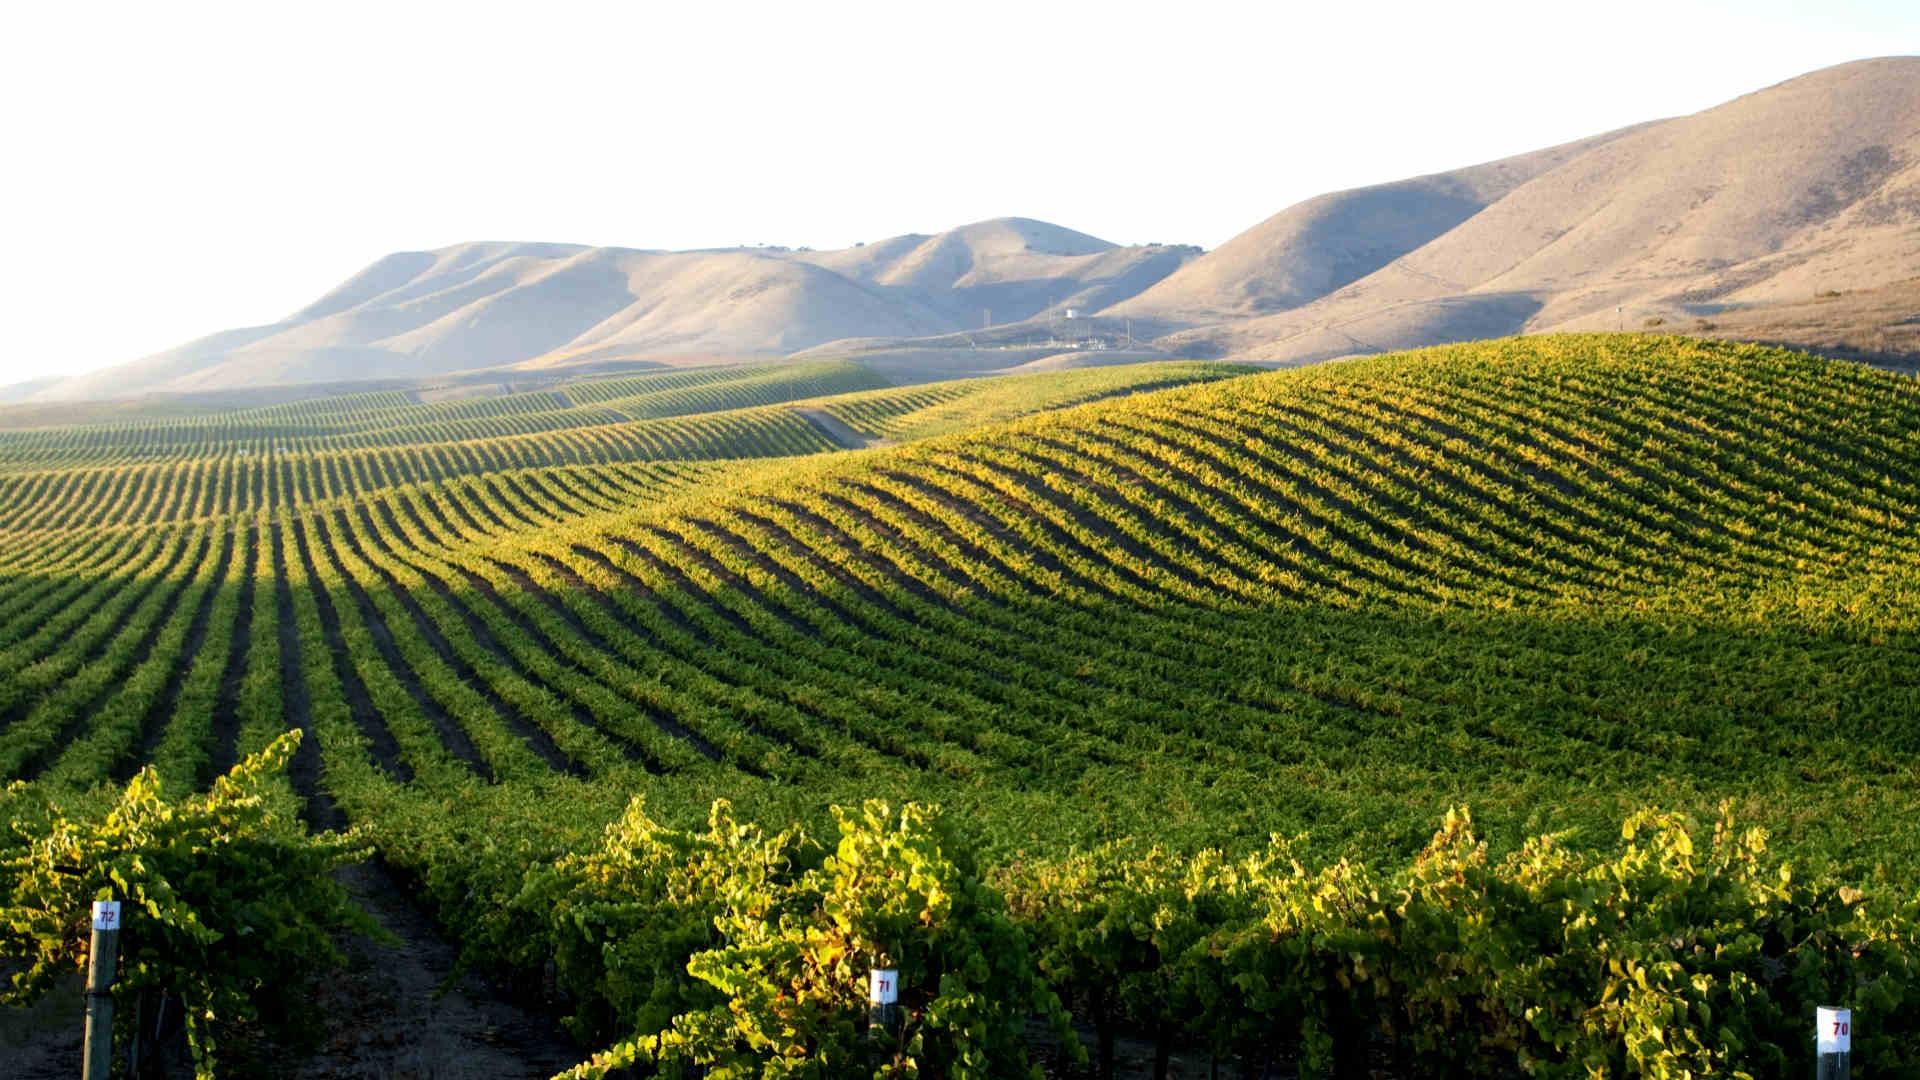 Cambria Vineyard (Jackson Family Wines)